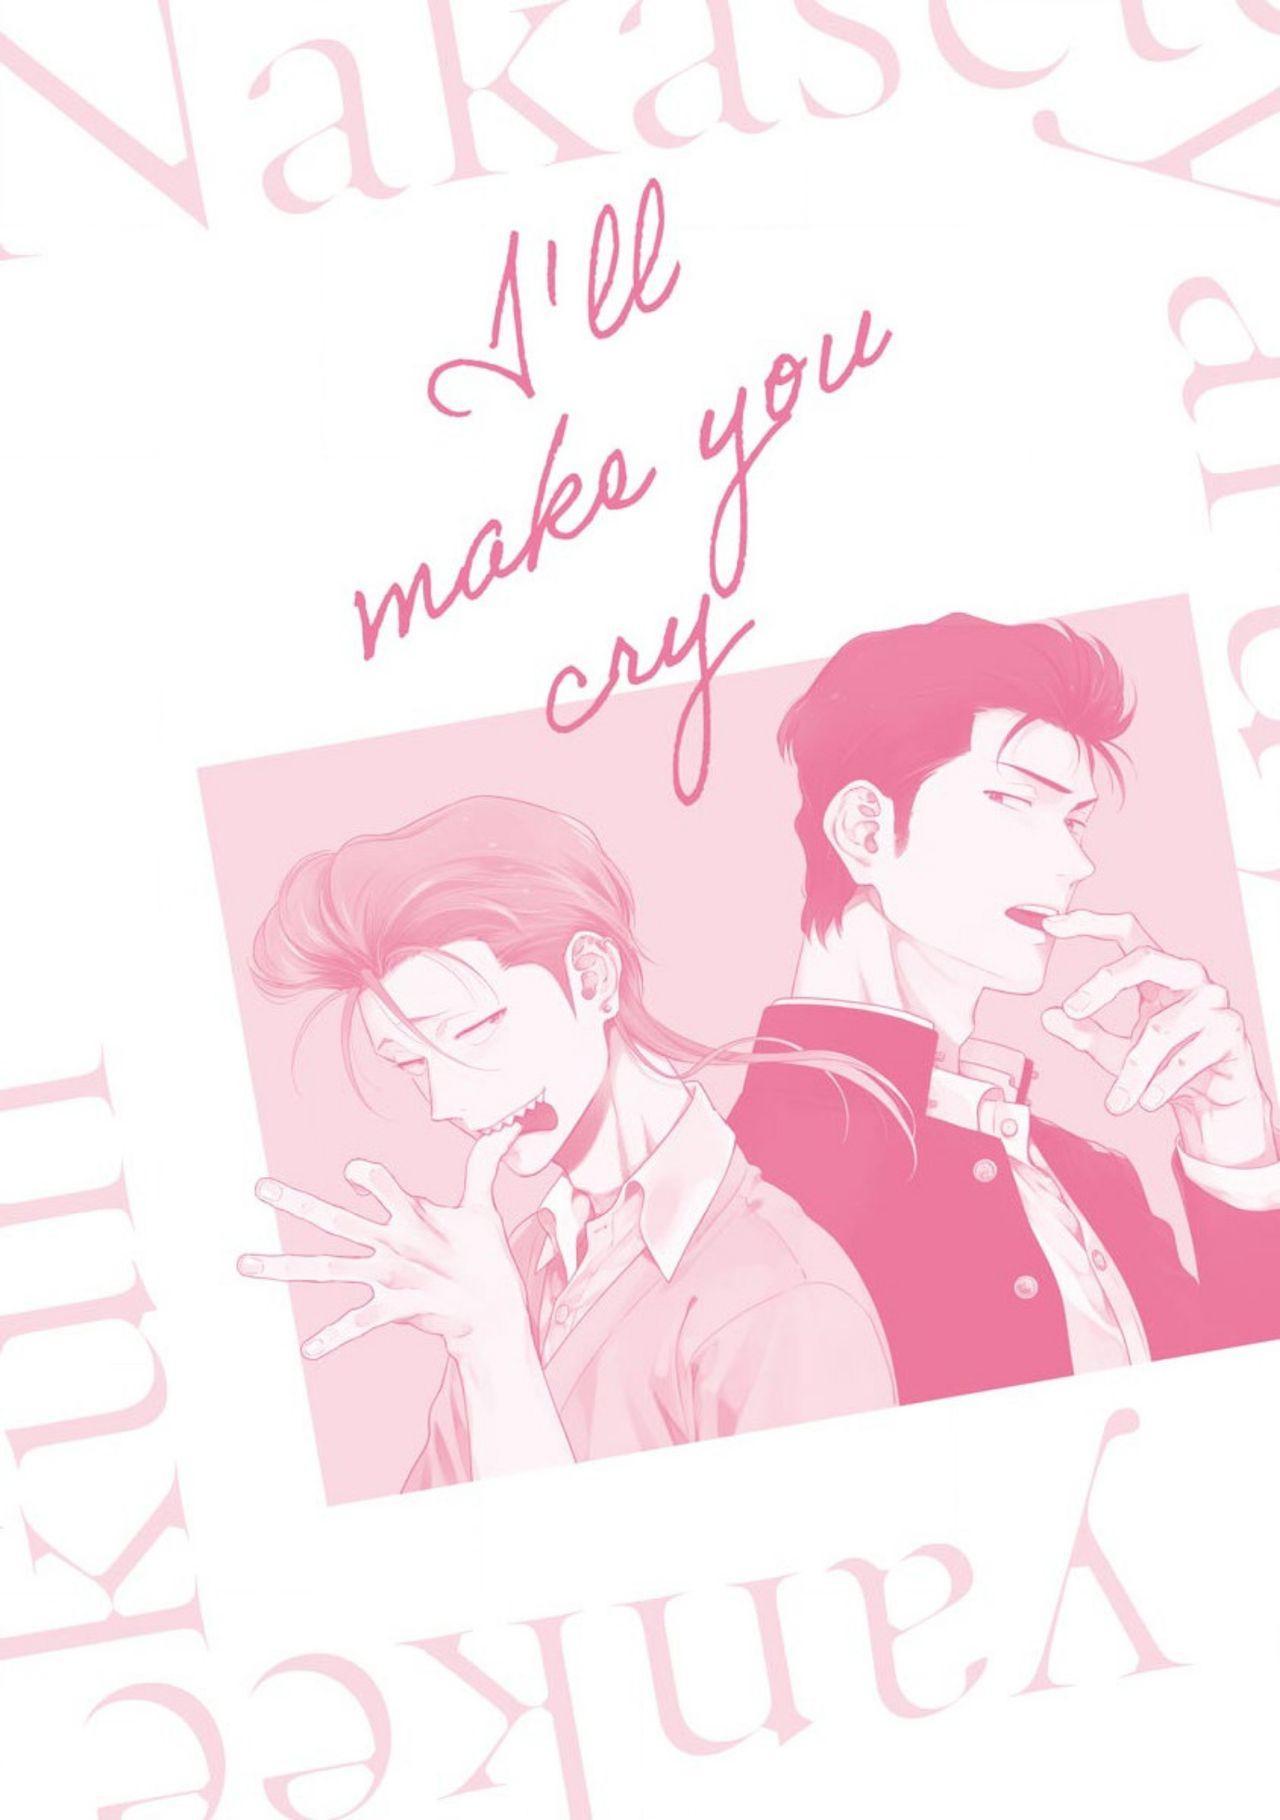 [Hiiragi Nozomu] Nakasete Yaru yo Yankee-kun   I'll Make You Cry Ch. 1-5 + Extras [English] [Digital] 202